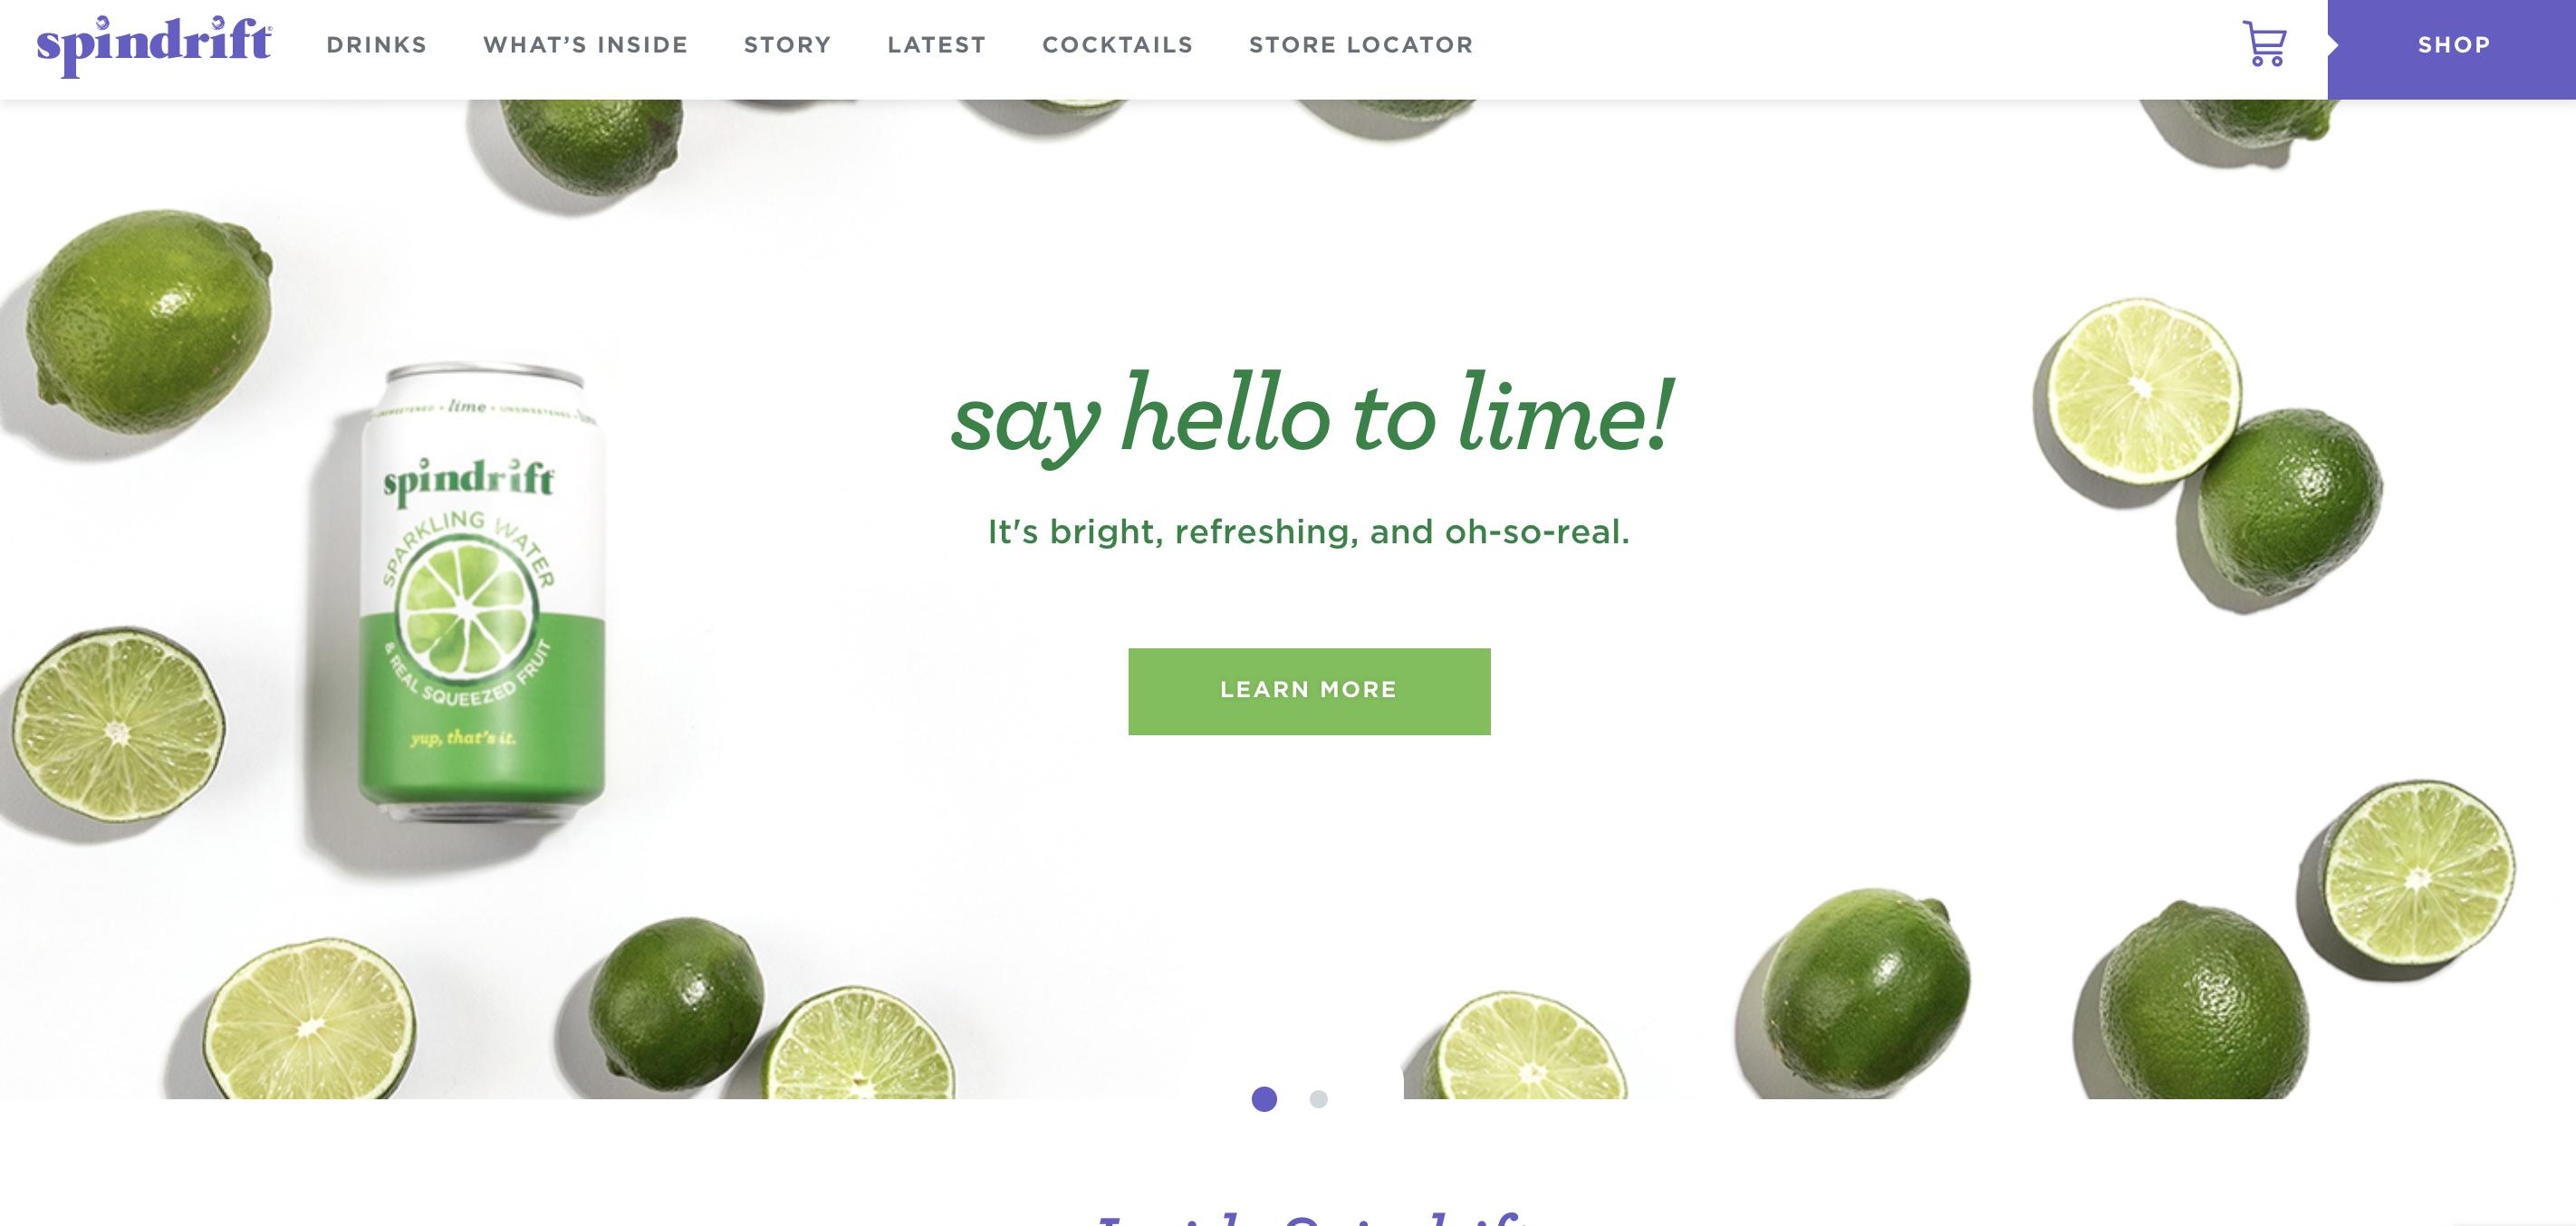 Spindrift Brand Messaging